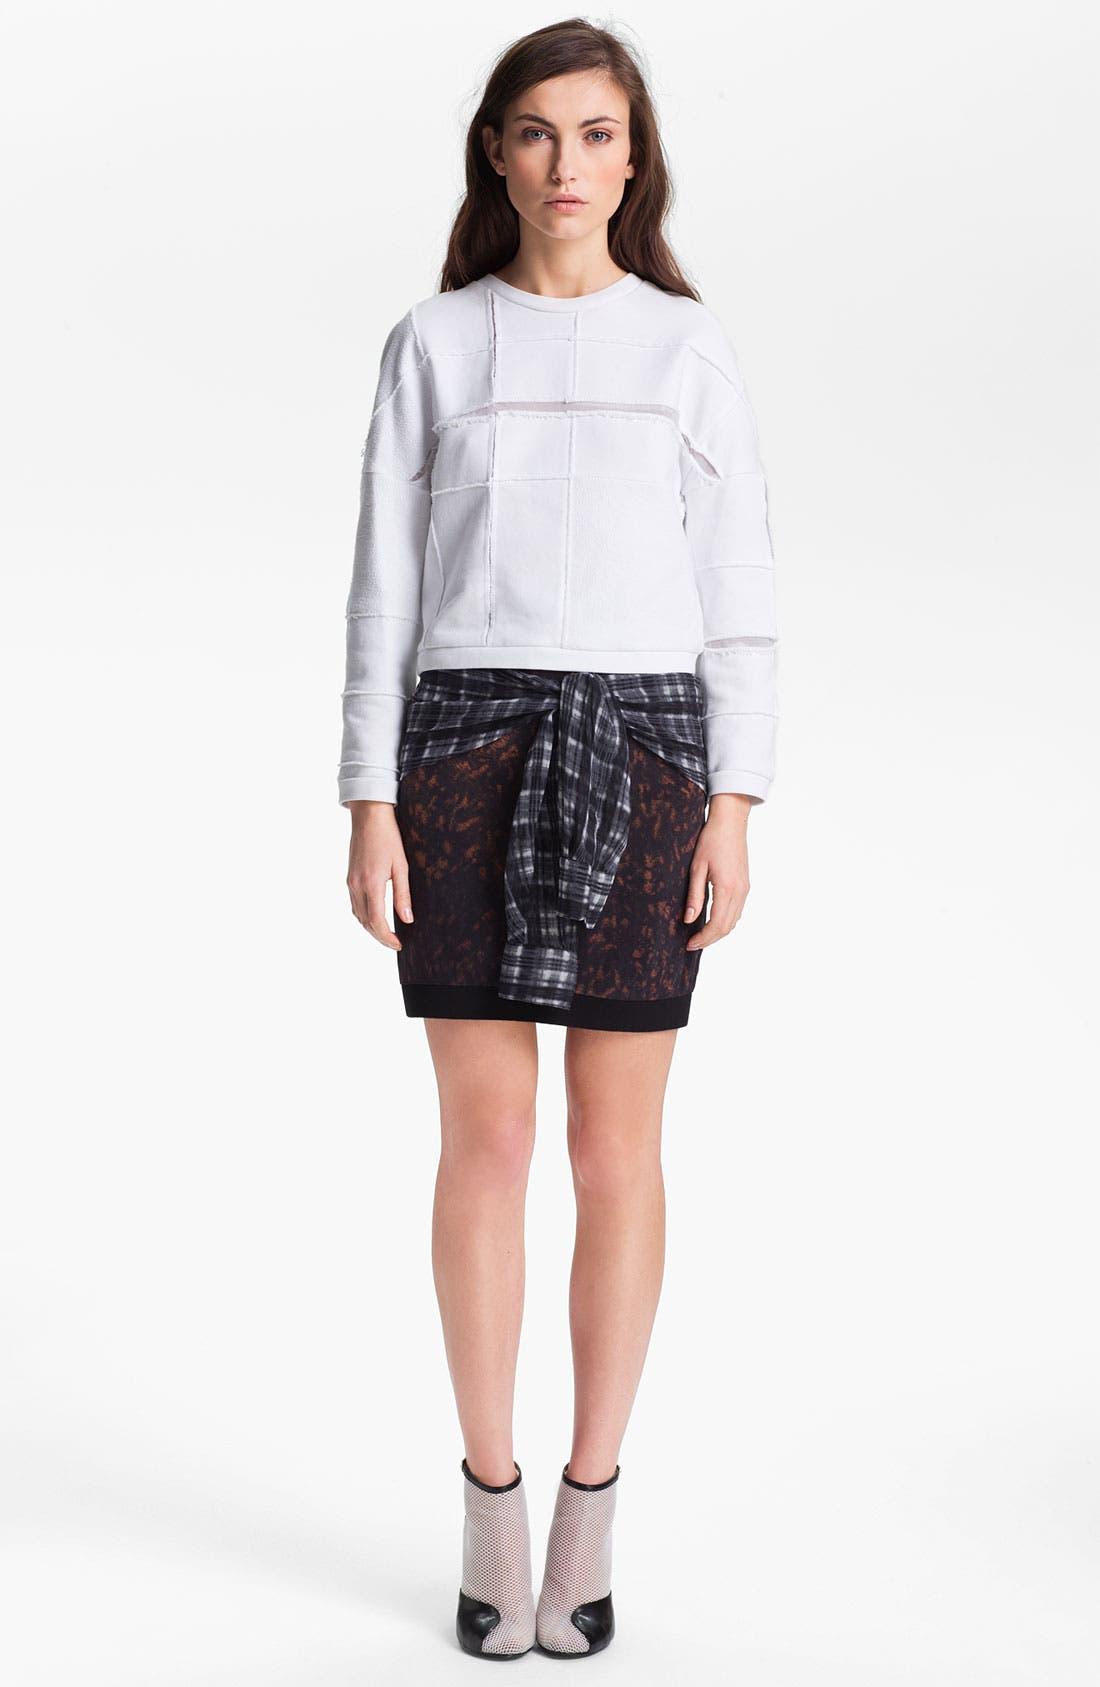 Alternate Image 1 Selected - 3.1 Phillip Lim 'Cut Up' Plaid Sweatshirt